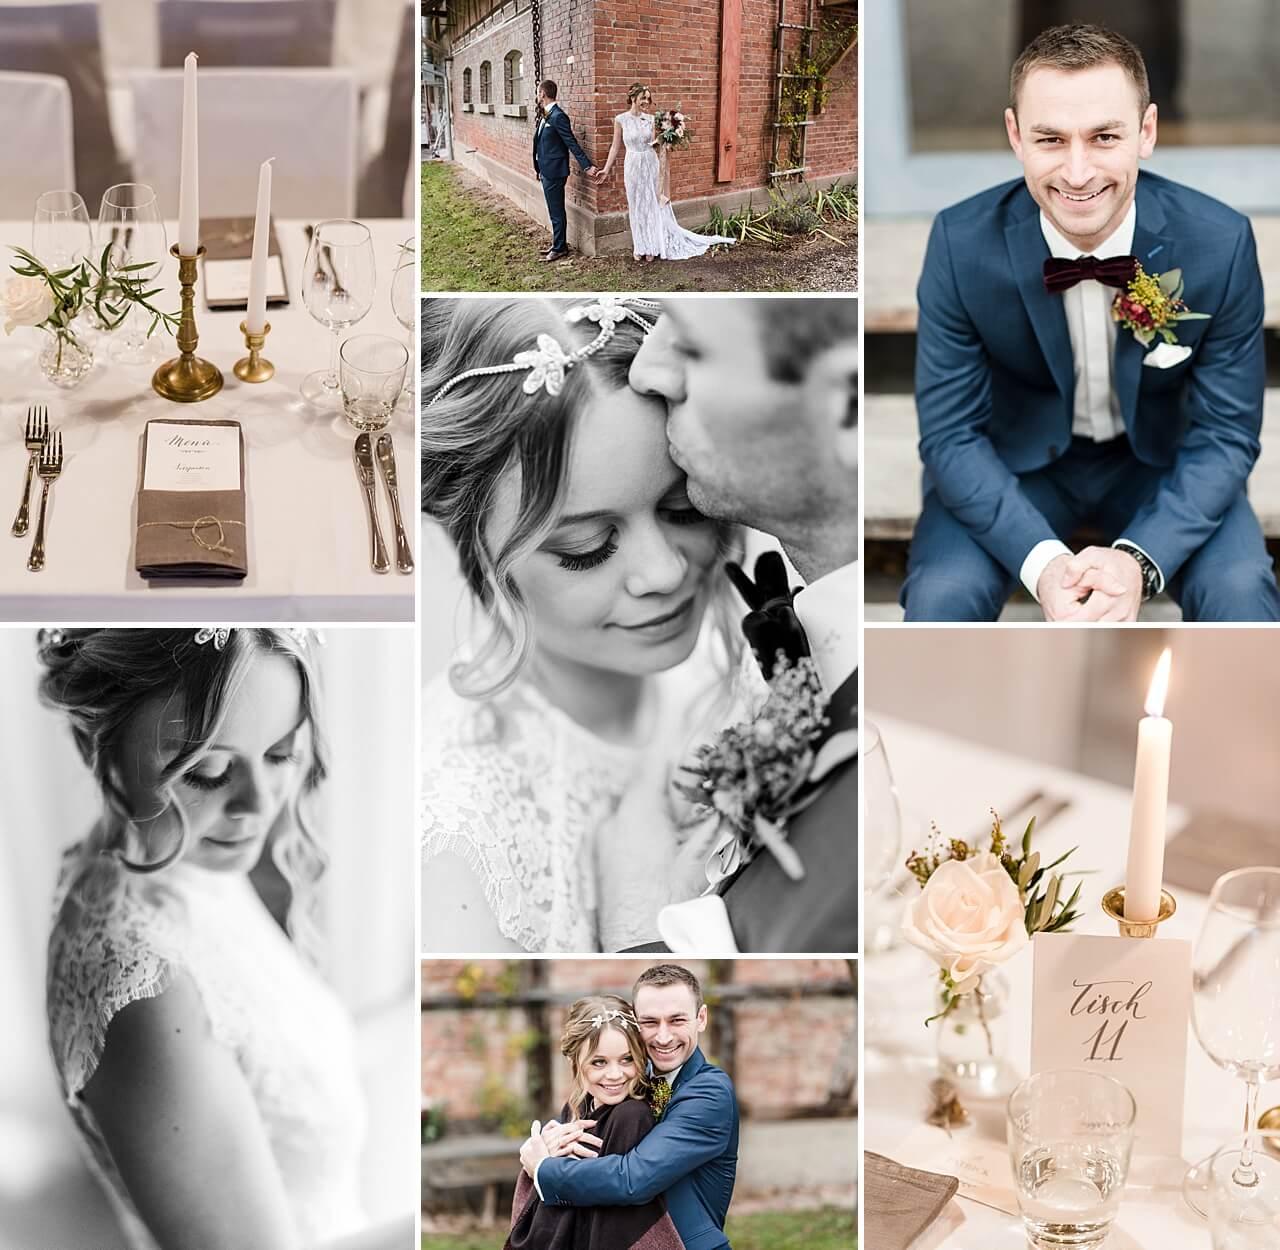 Rebecca Conte Fotografie: Verschiebung Hochzeit wegen Corona 01